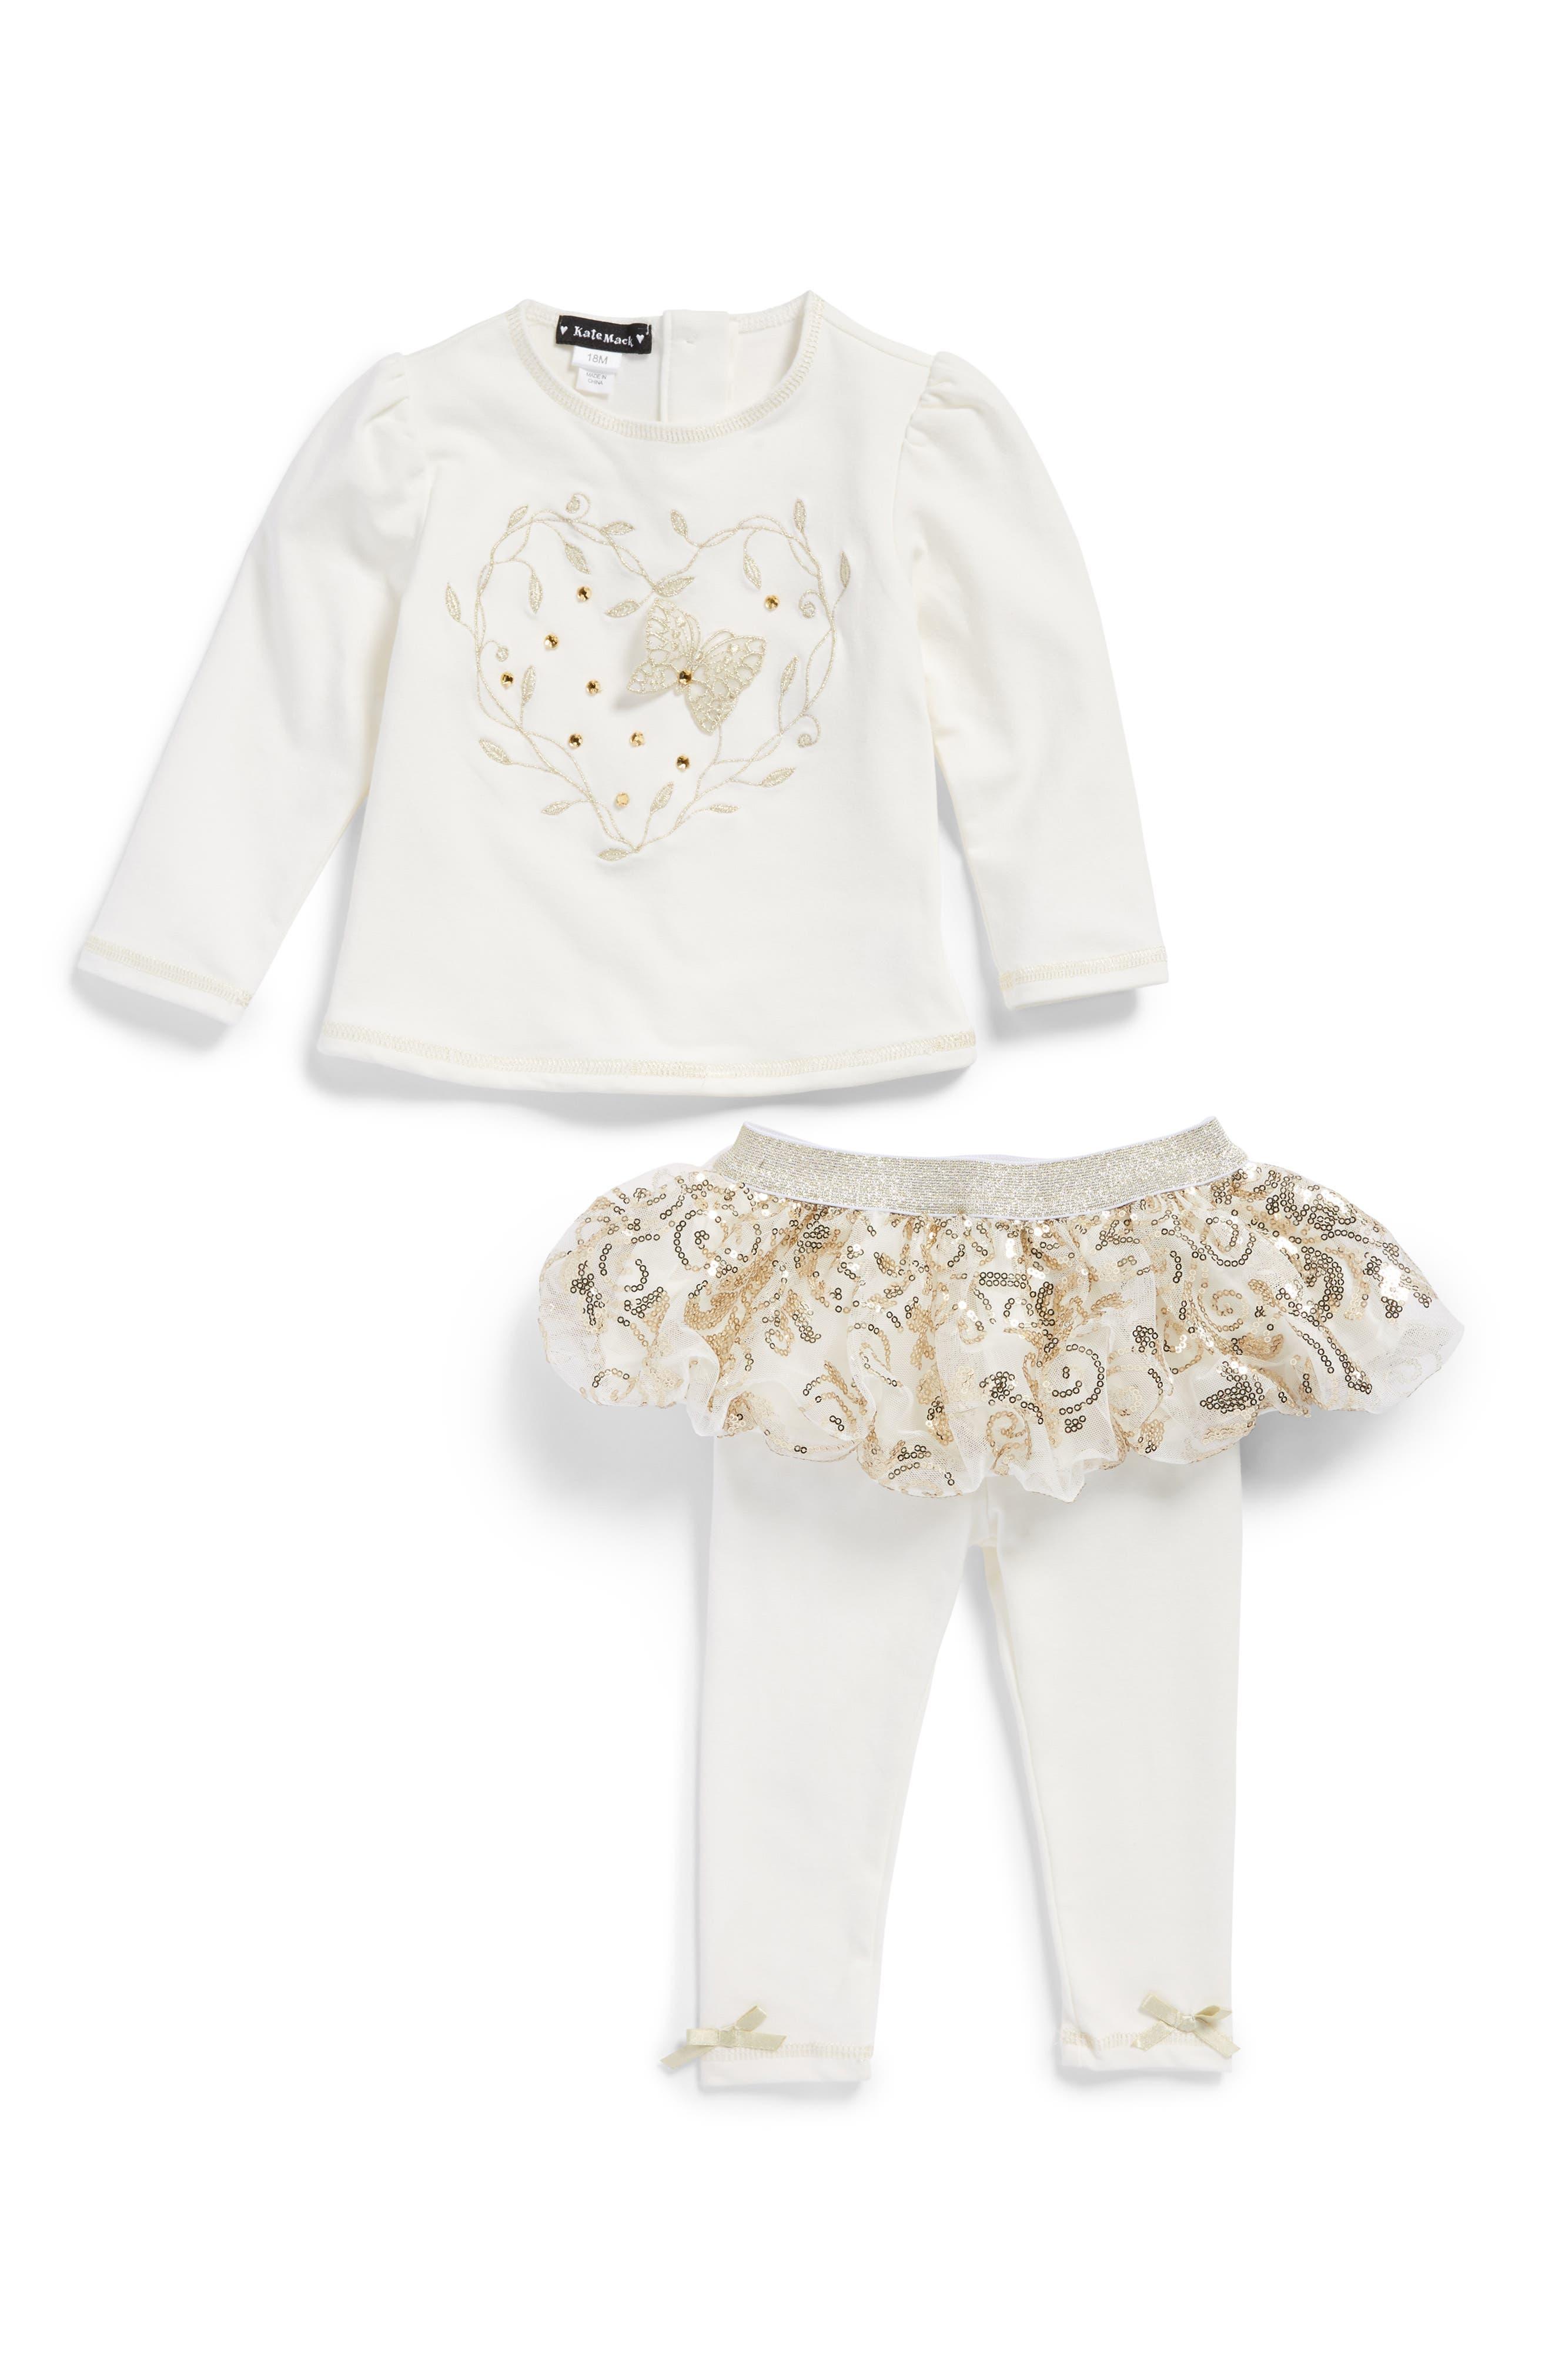 Alternate Image 1 Selected - Kate Mack Embroidered Top & Skirted Leggings Set (Baby Girls)